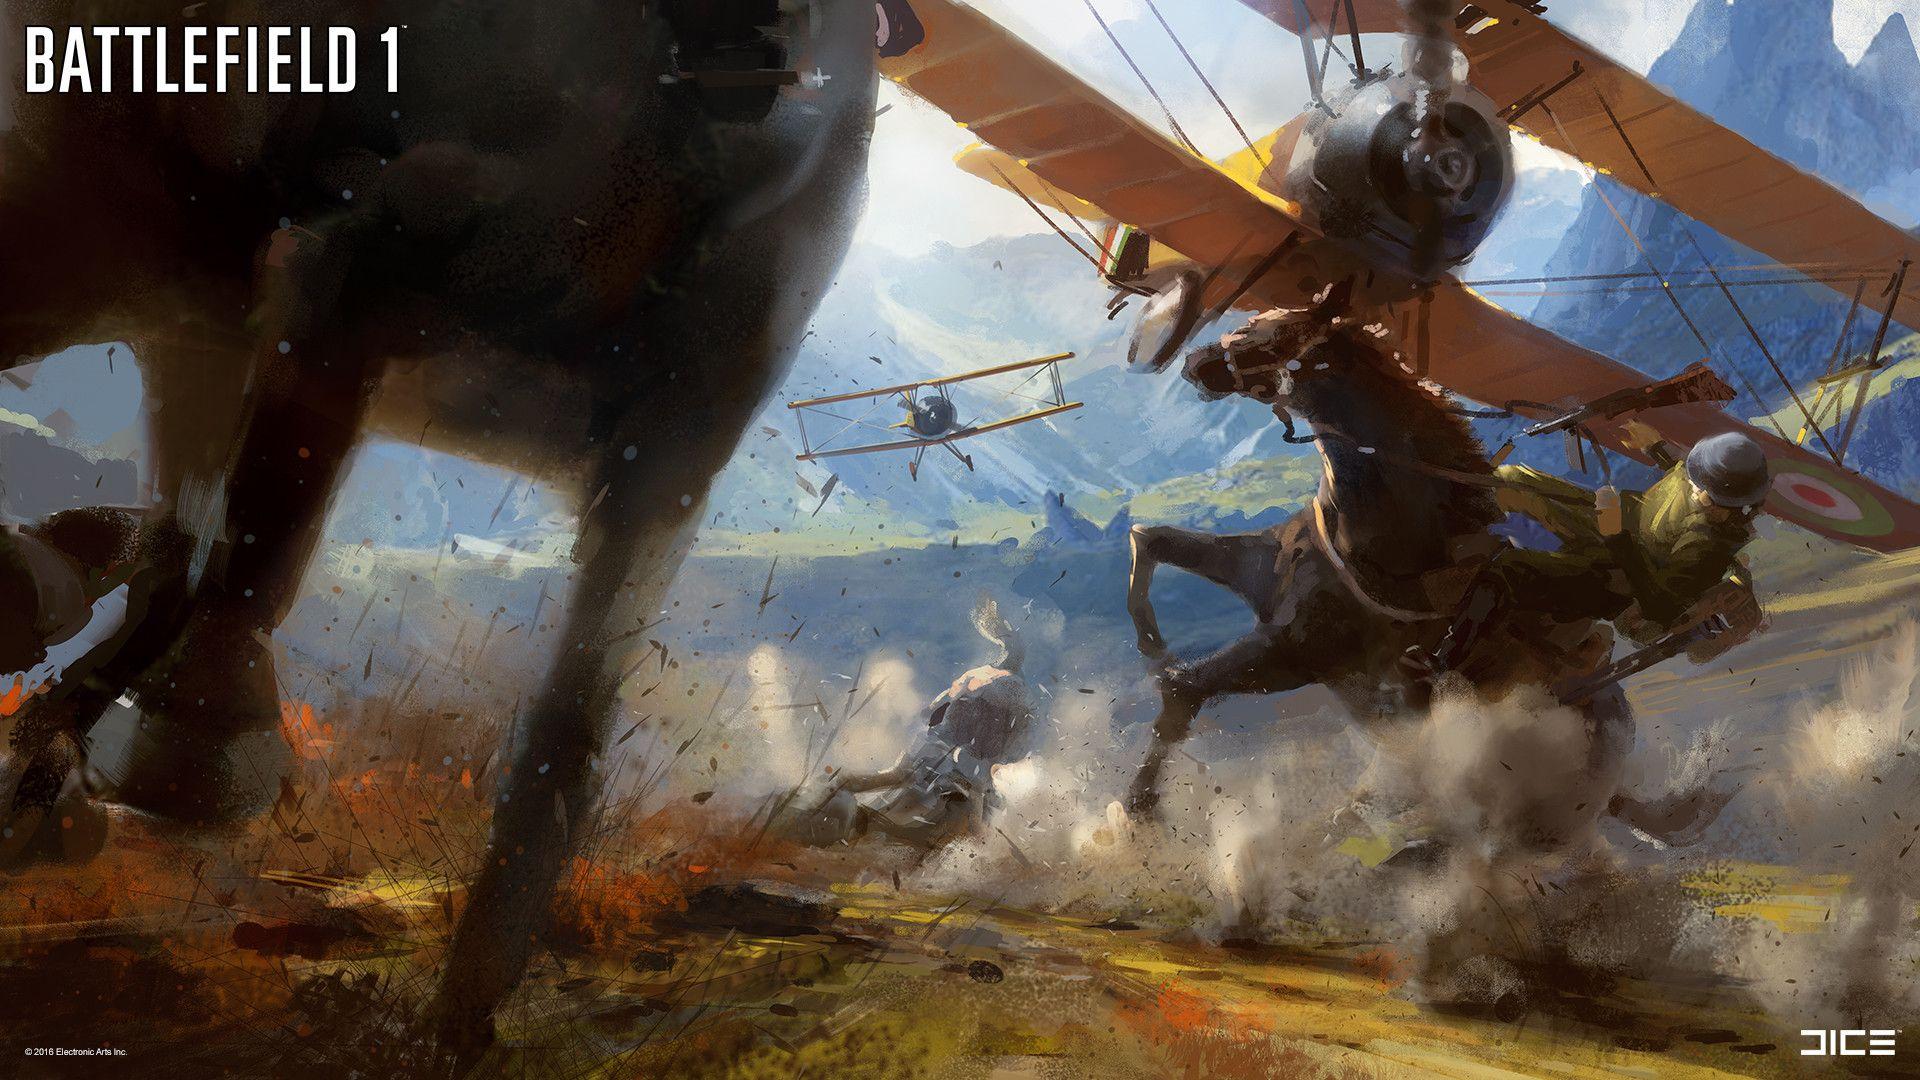 2a0245dfc39d8d243c74aca3ab8f8c80 - How To Get In A Plane In Battlefield 1